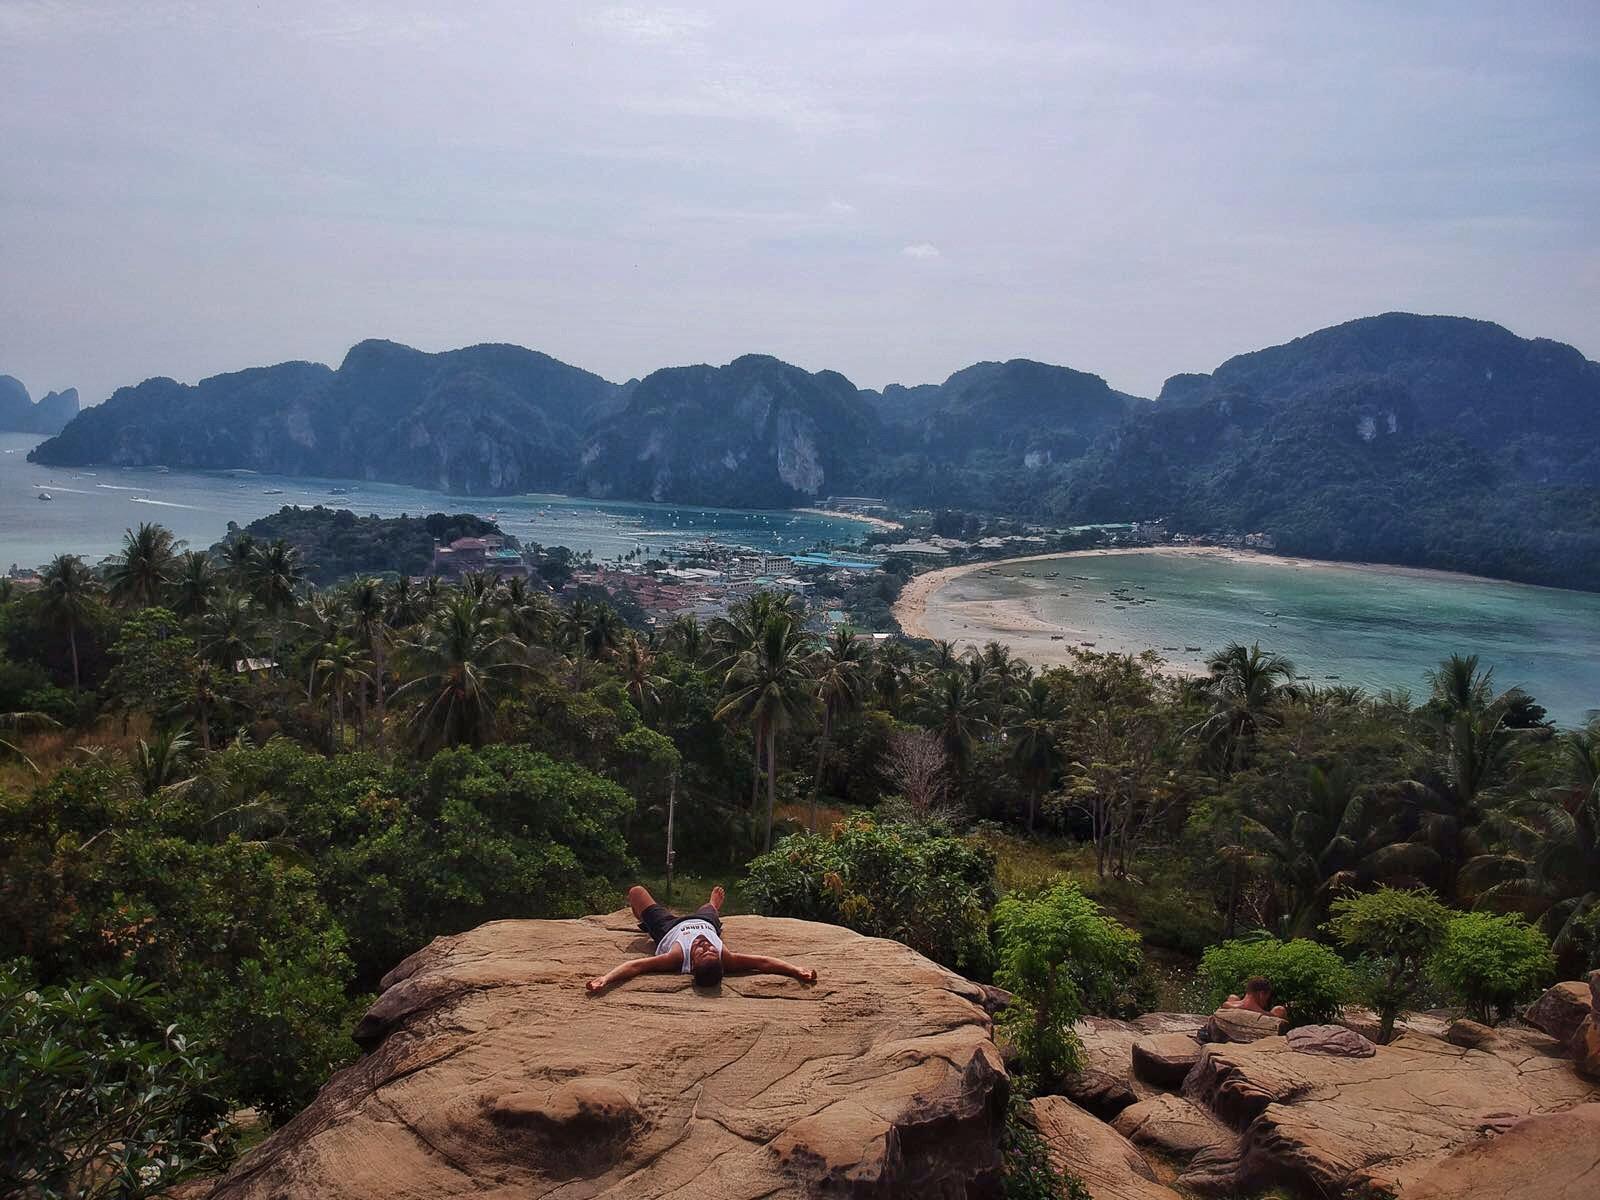 Tayland, Koh Phangan / Dünya Turu Uyanış Yolculuğu